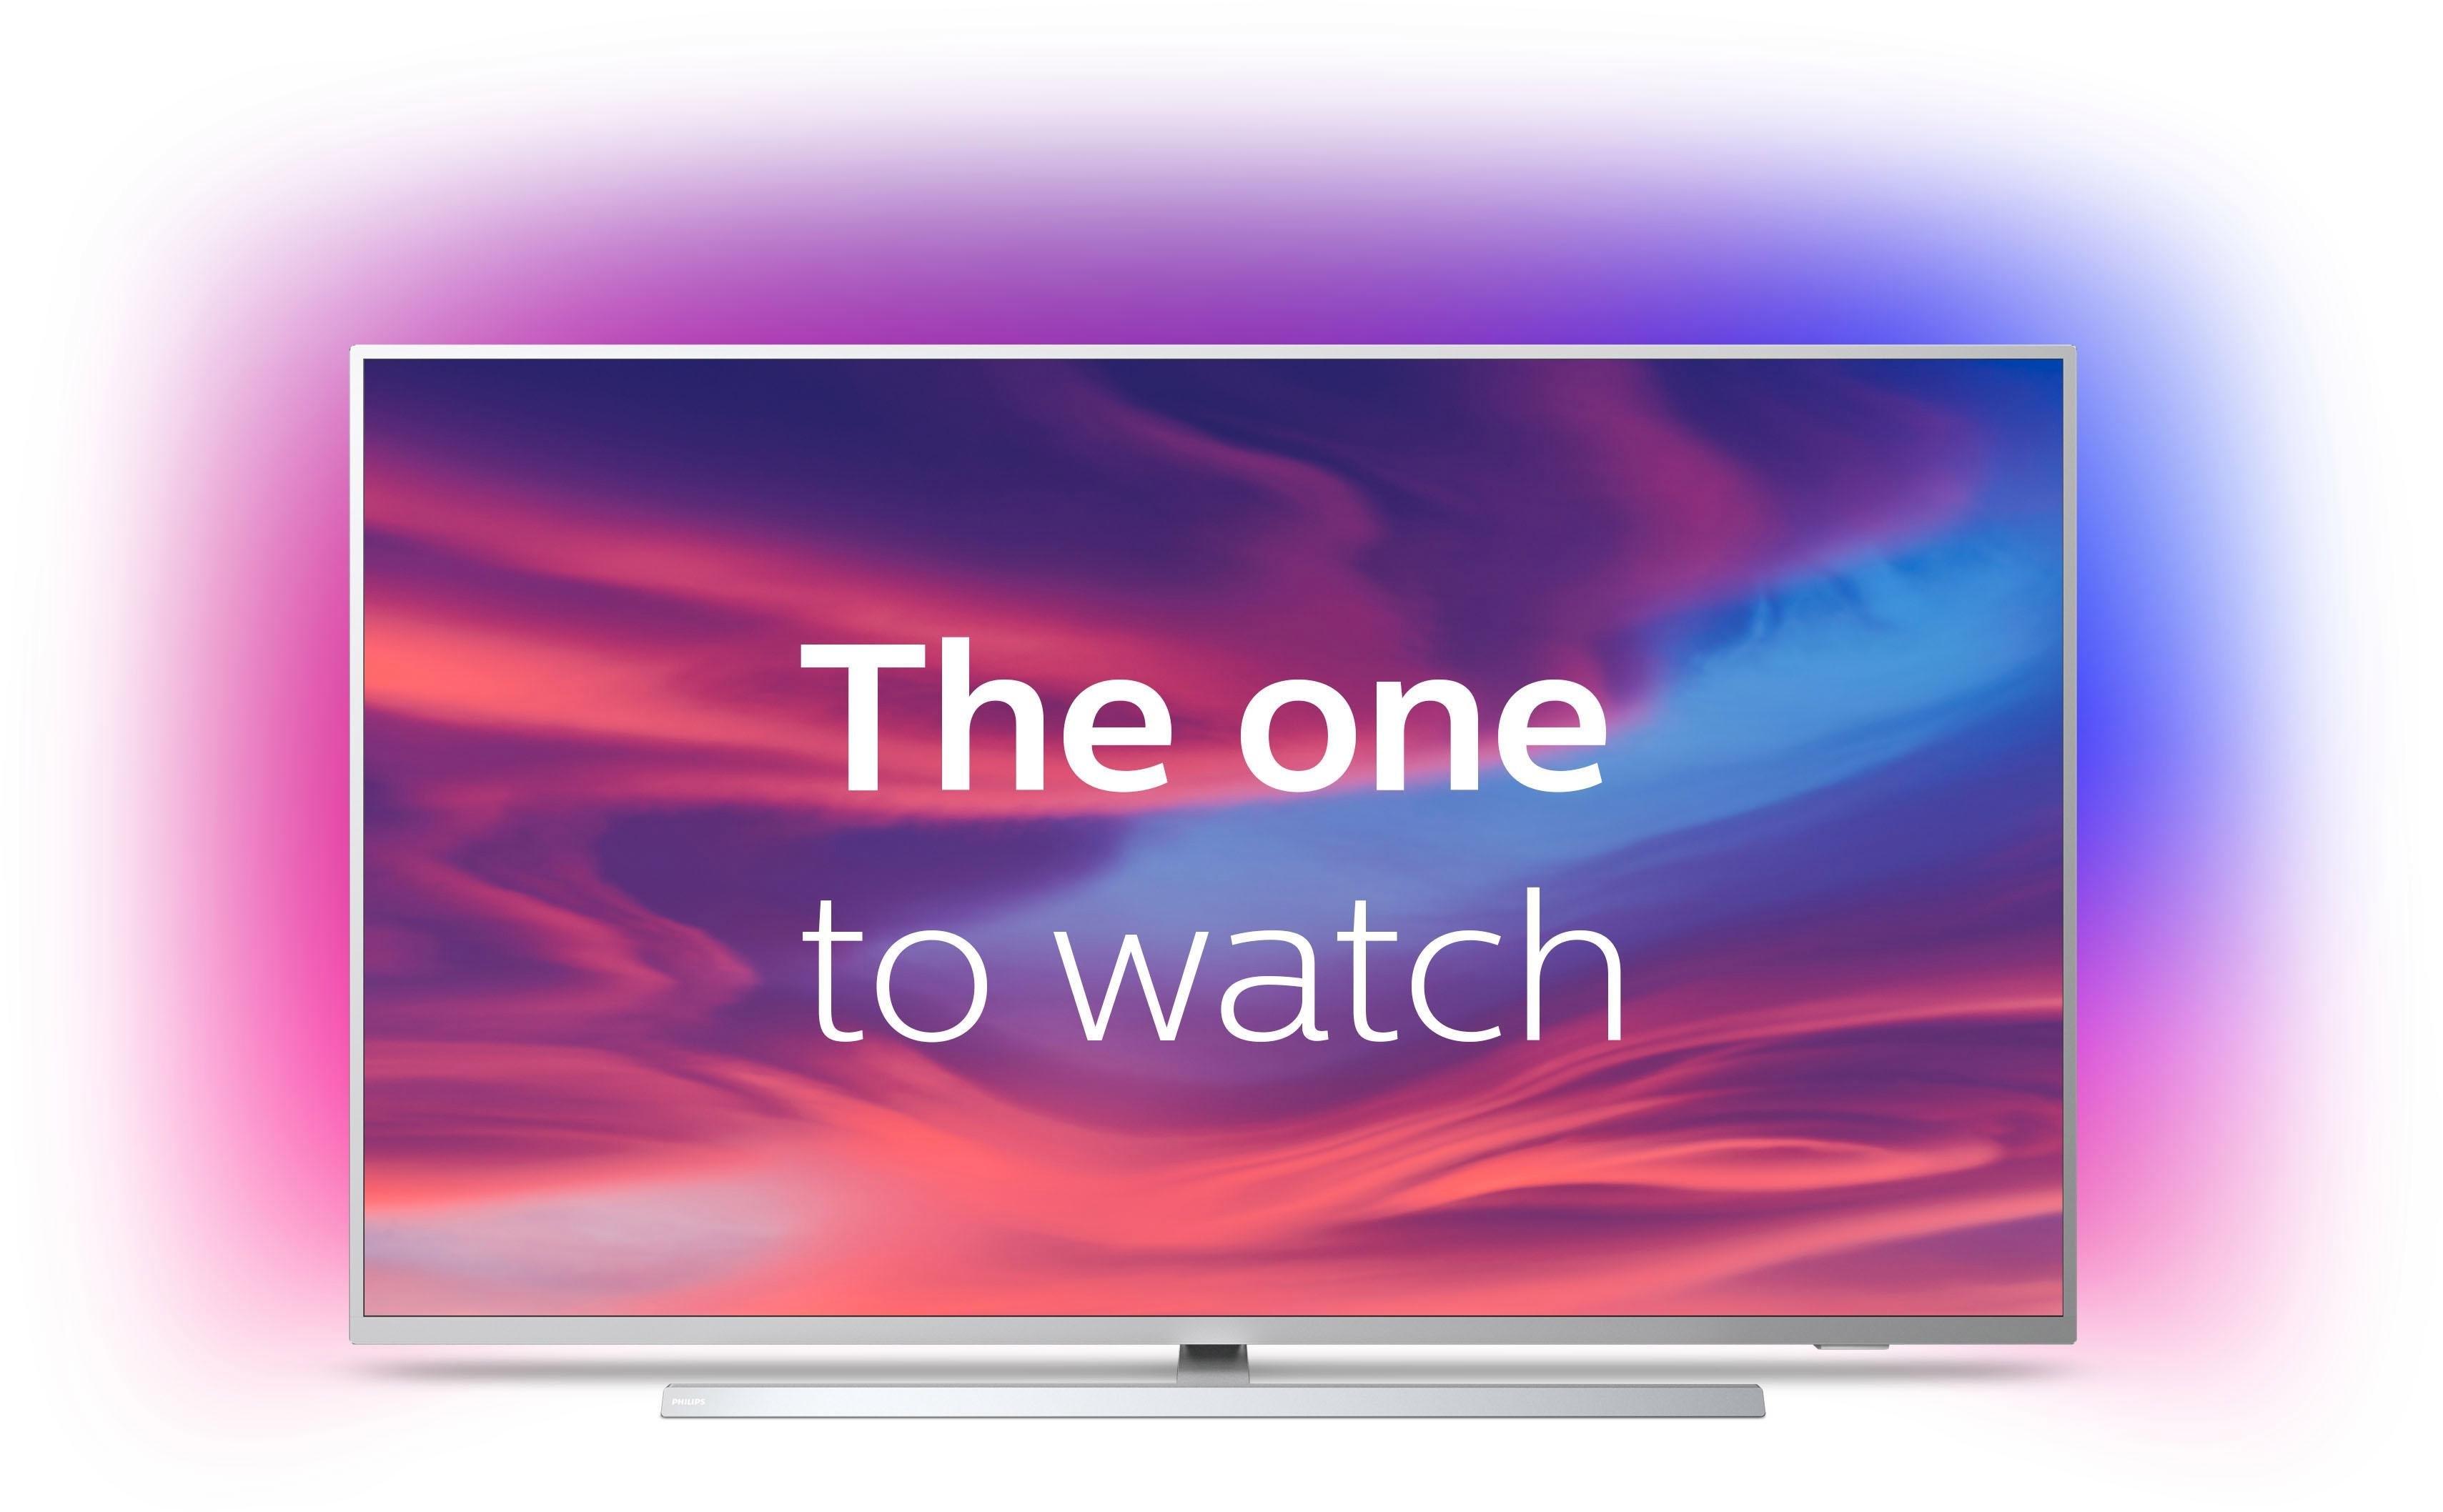 Philips 'The One' 55PUS7304/12 led-tv (139 cm / 55 inch), 4K Ultra HD, smart-tv online kopen op otto.nl